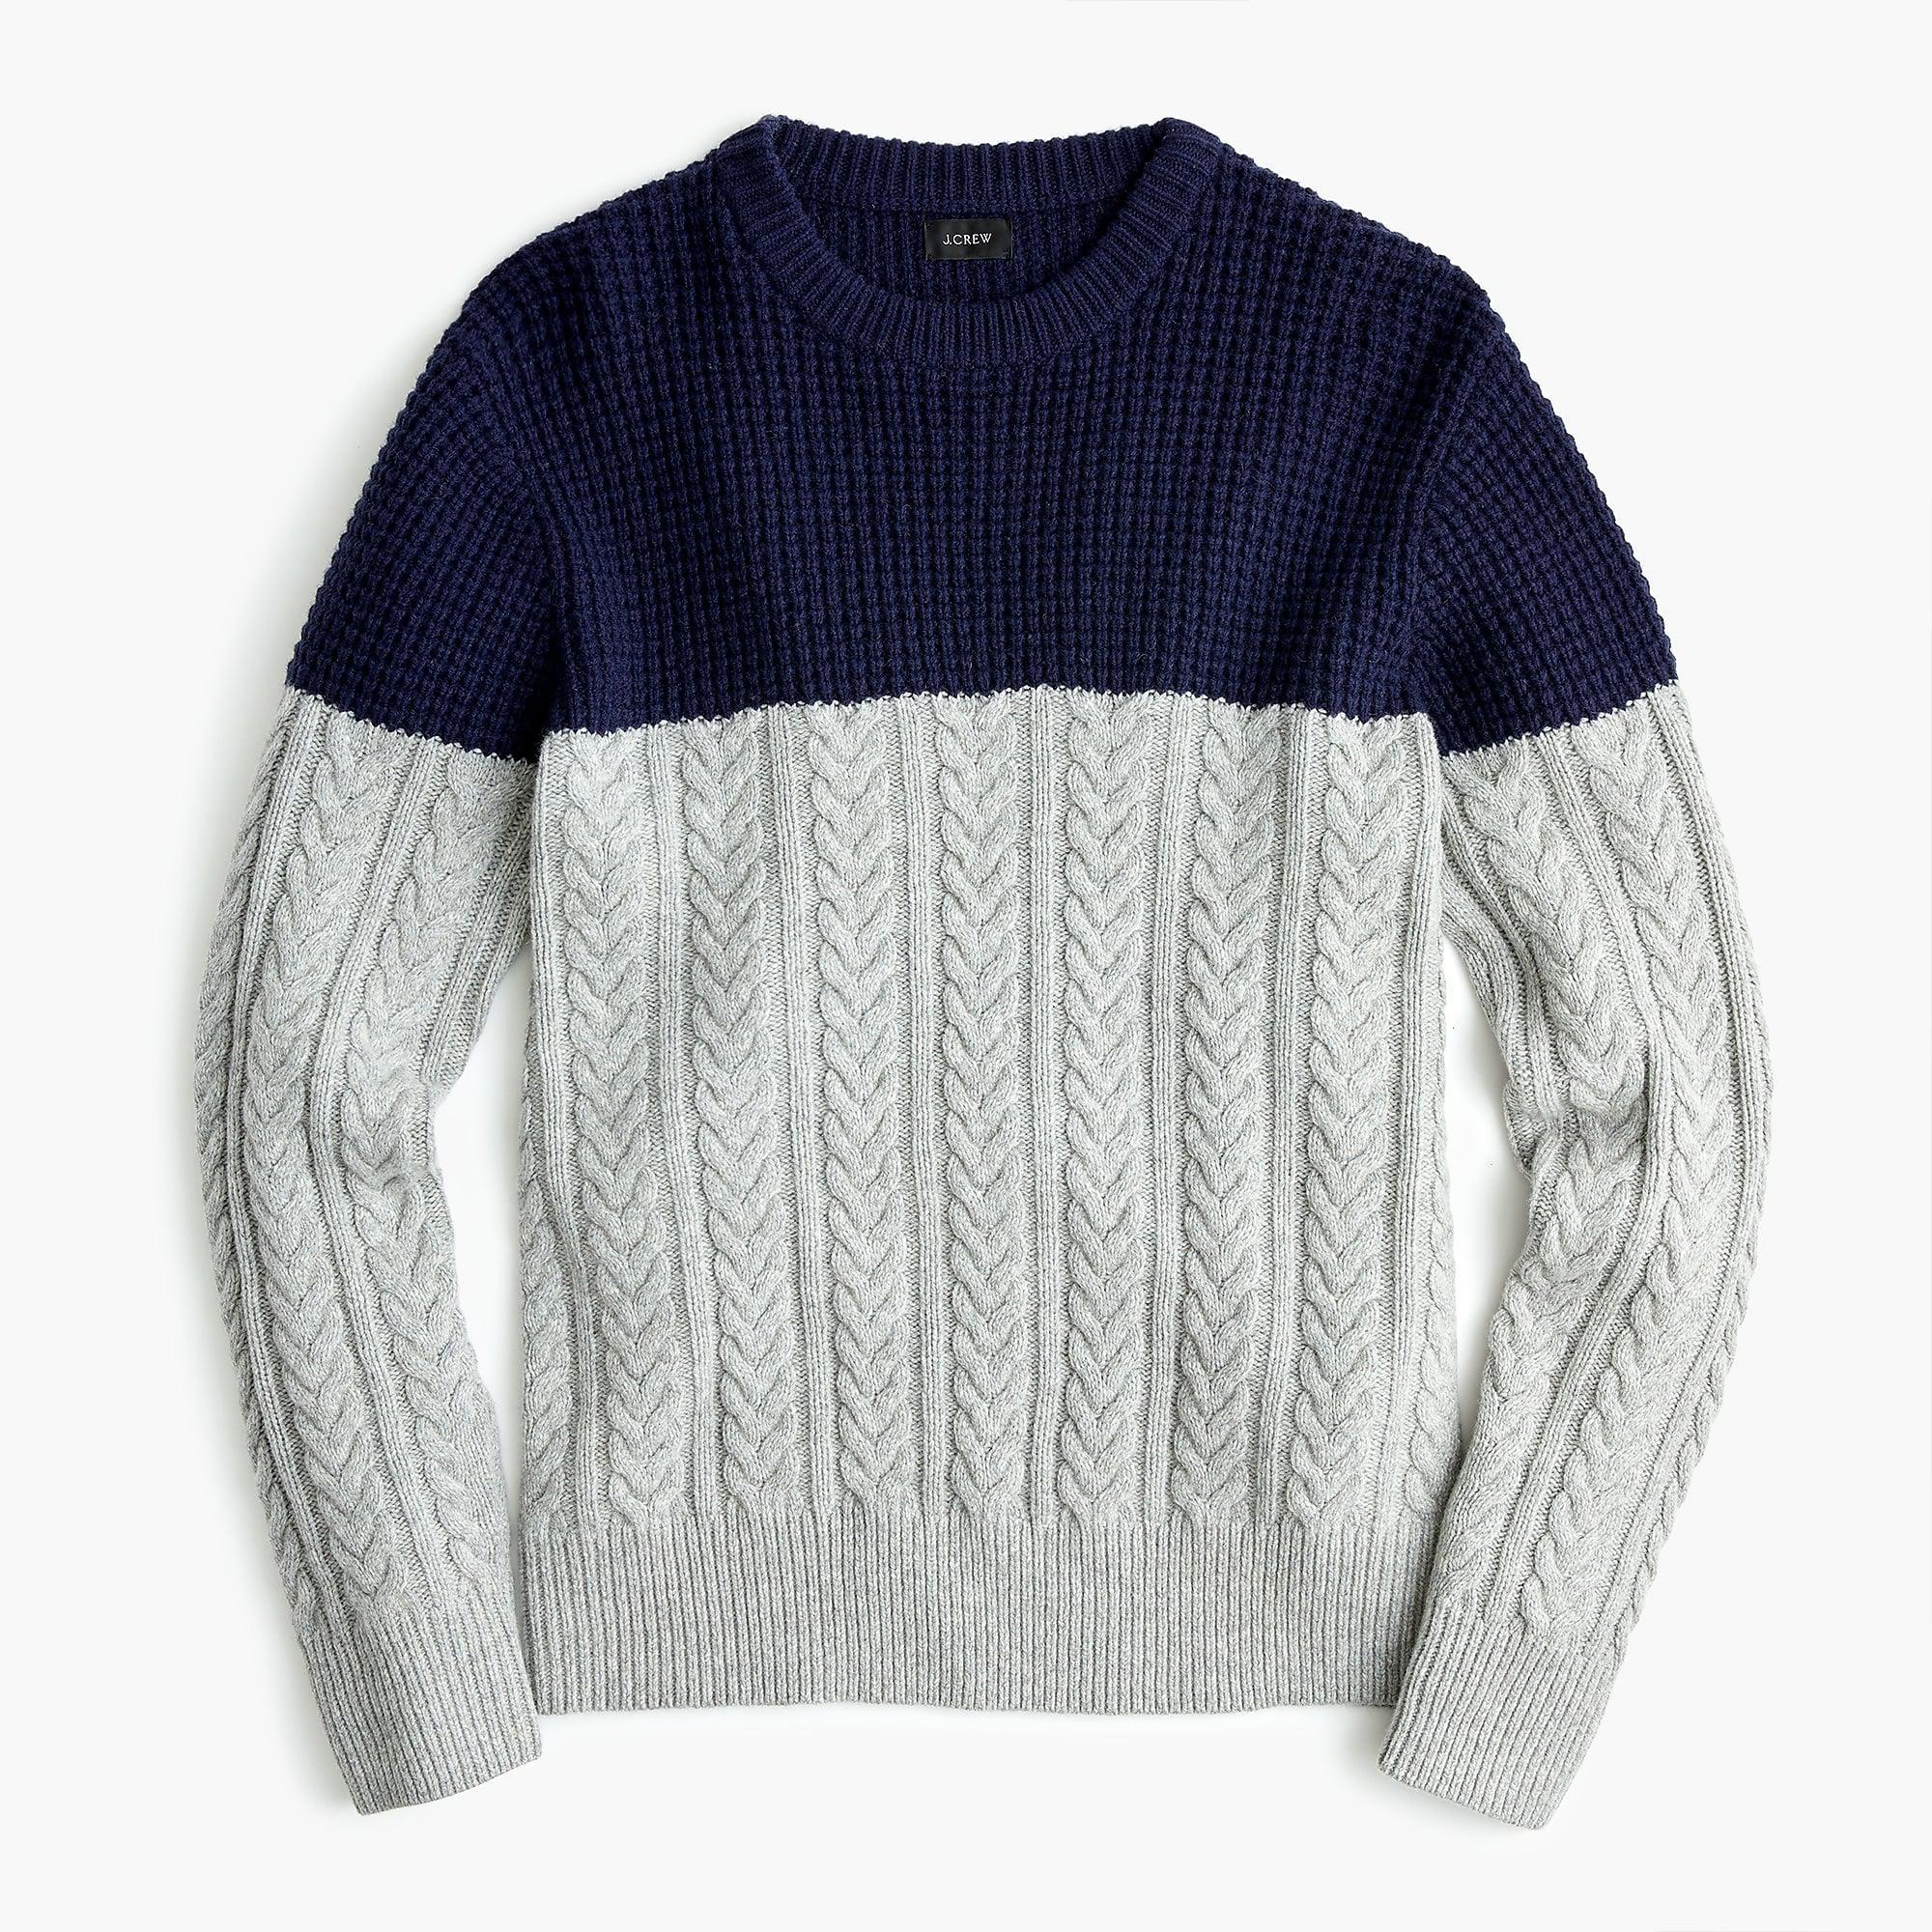 1a8ff1dac J.Crew - Blue Rugged Merino Wool Mixed-knit Crewneck Sweater for Men -.  View fullscreen